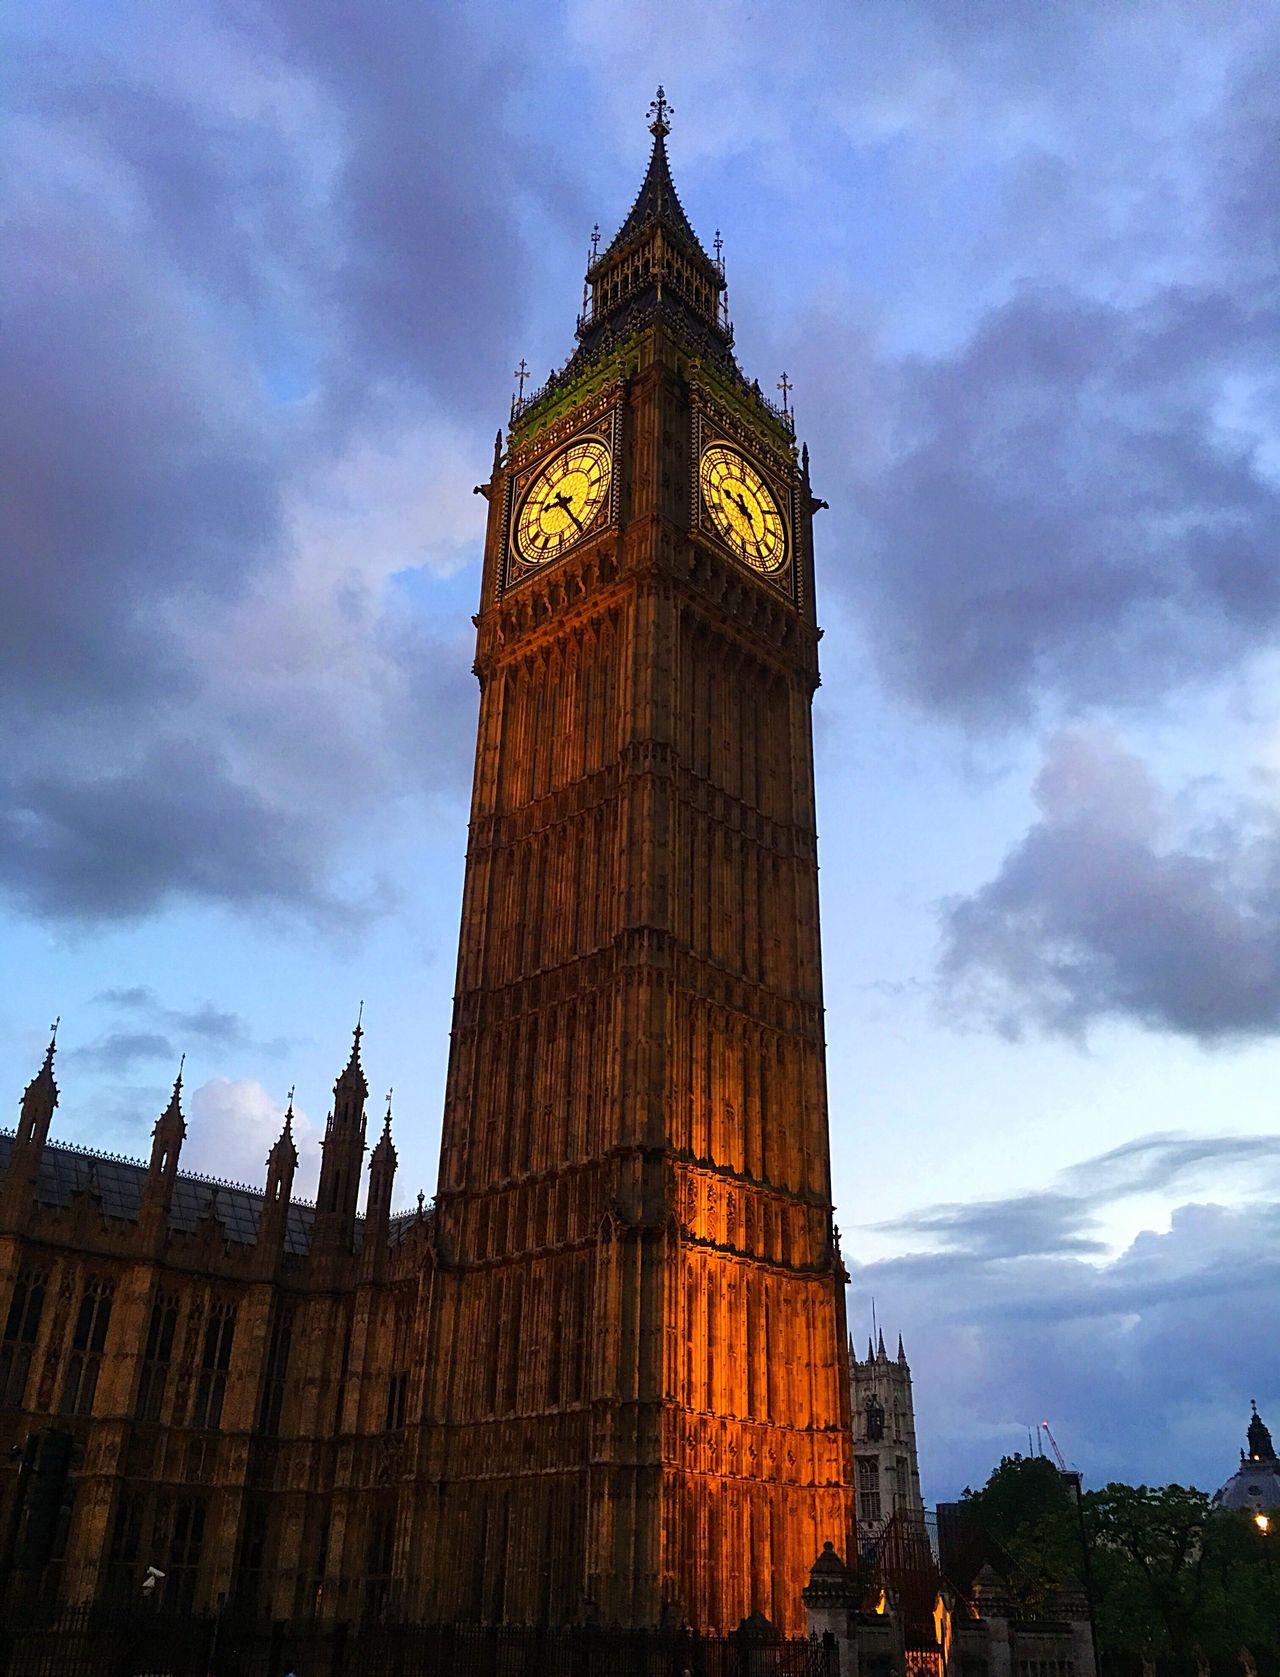 Big Ben London Architecture Travel Destinations Sunset EyeEmNewHere